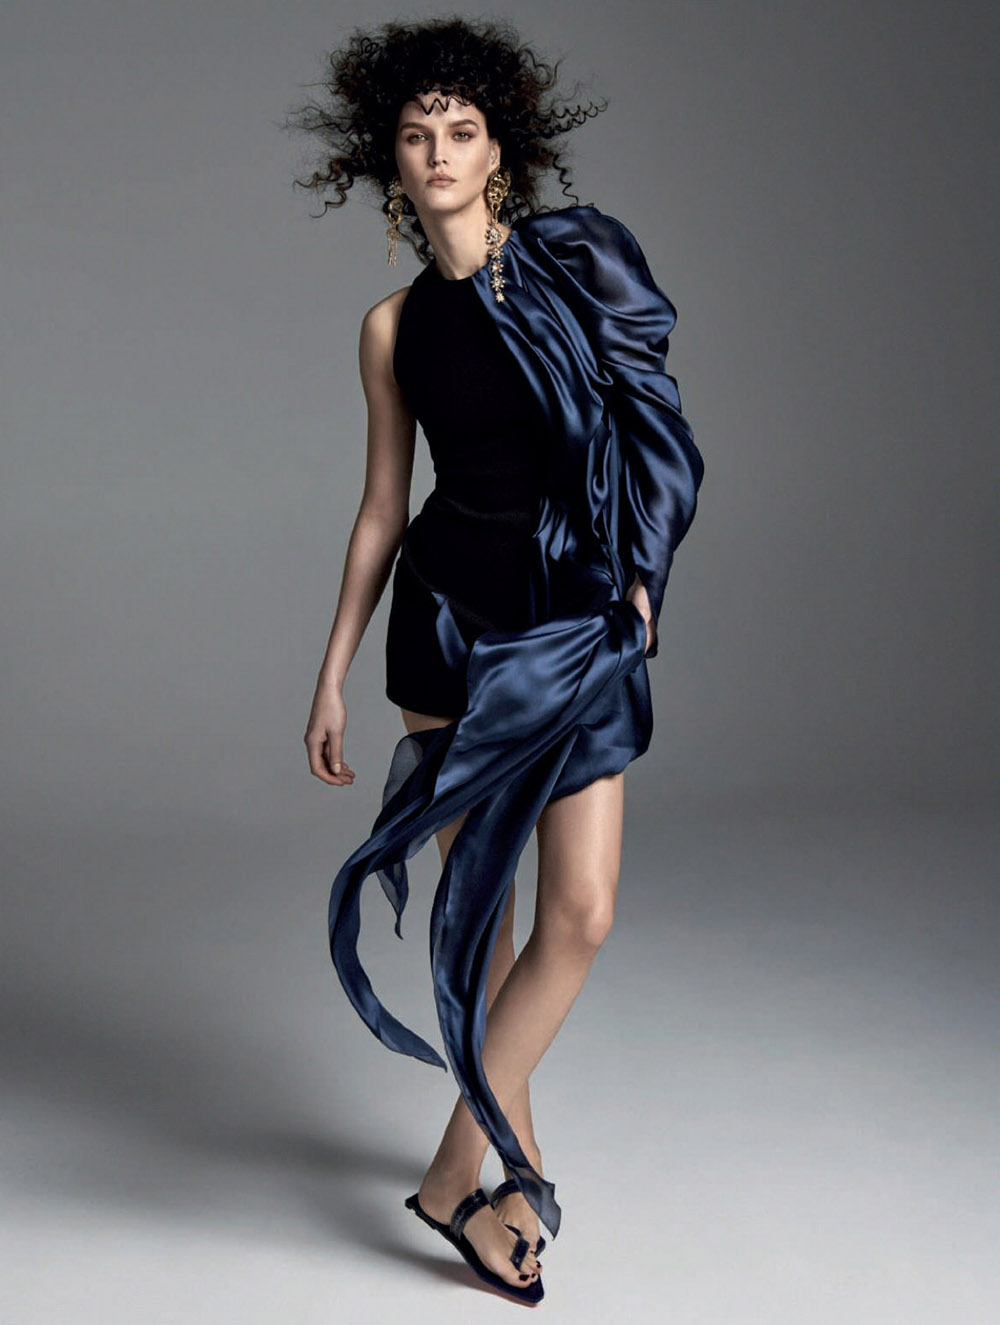 Kätlin Aas by Jonathan Segade for Harper's Bazaar Spain May 2020